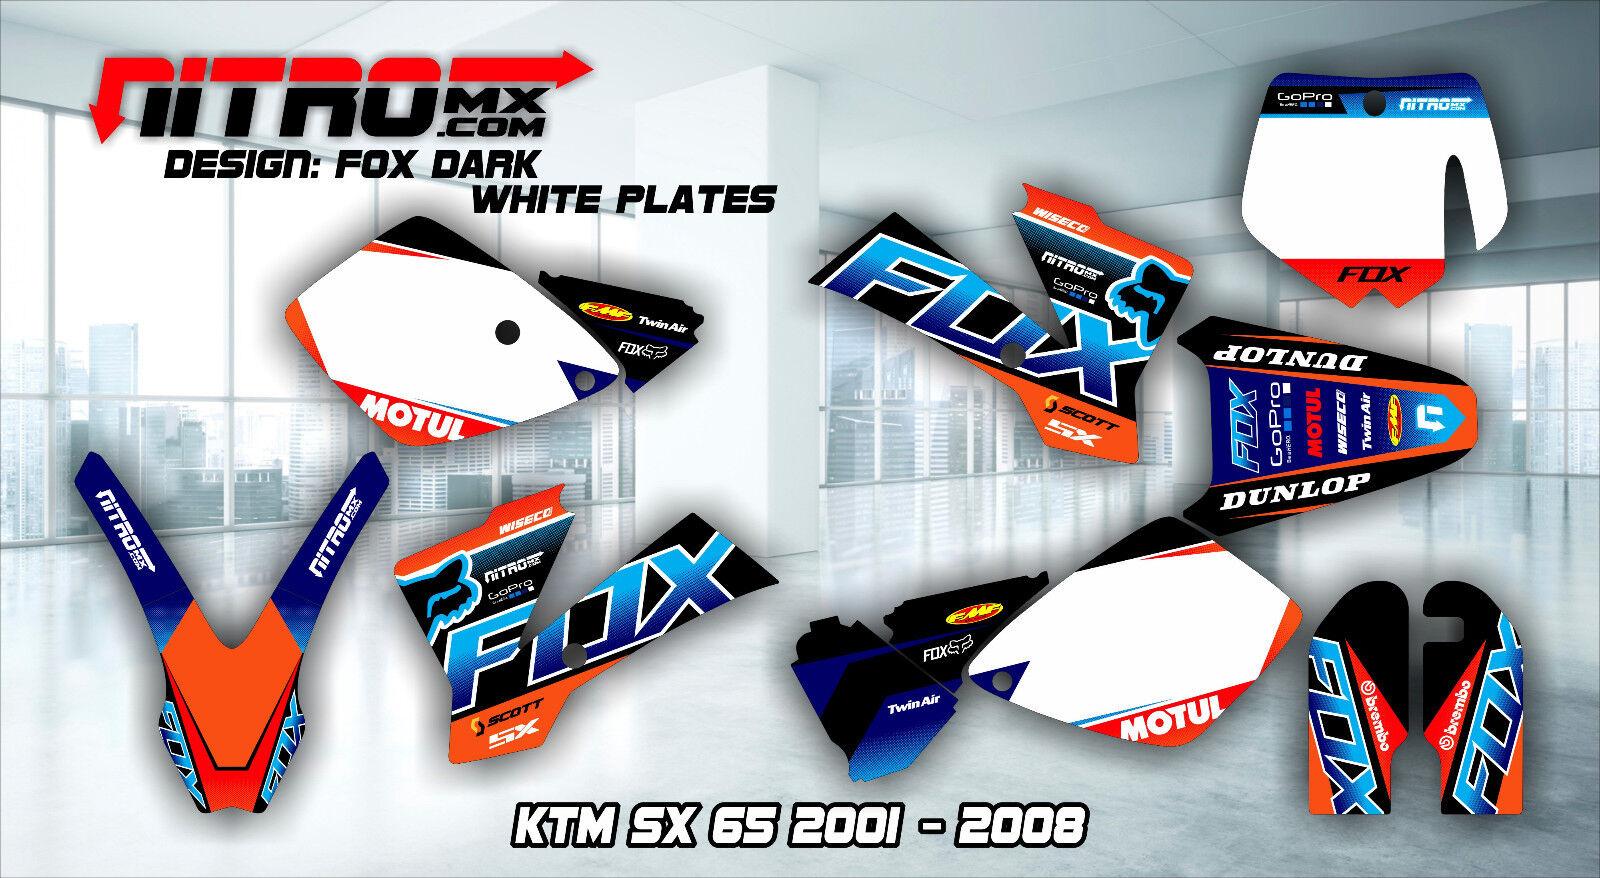 NitroMX Graphic Kit for KTM SX 65 SX65 2001 2002 2003 2004 2005 2006 2007 2008